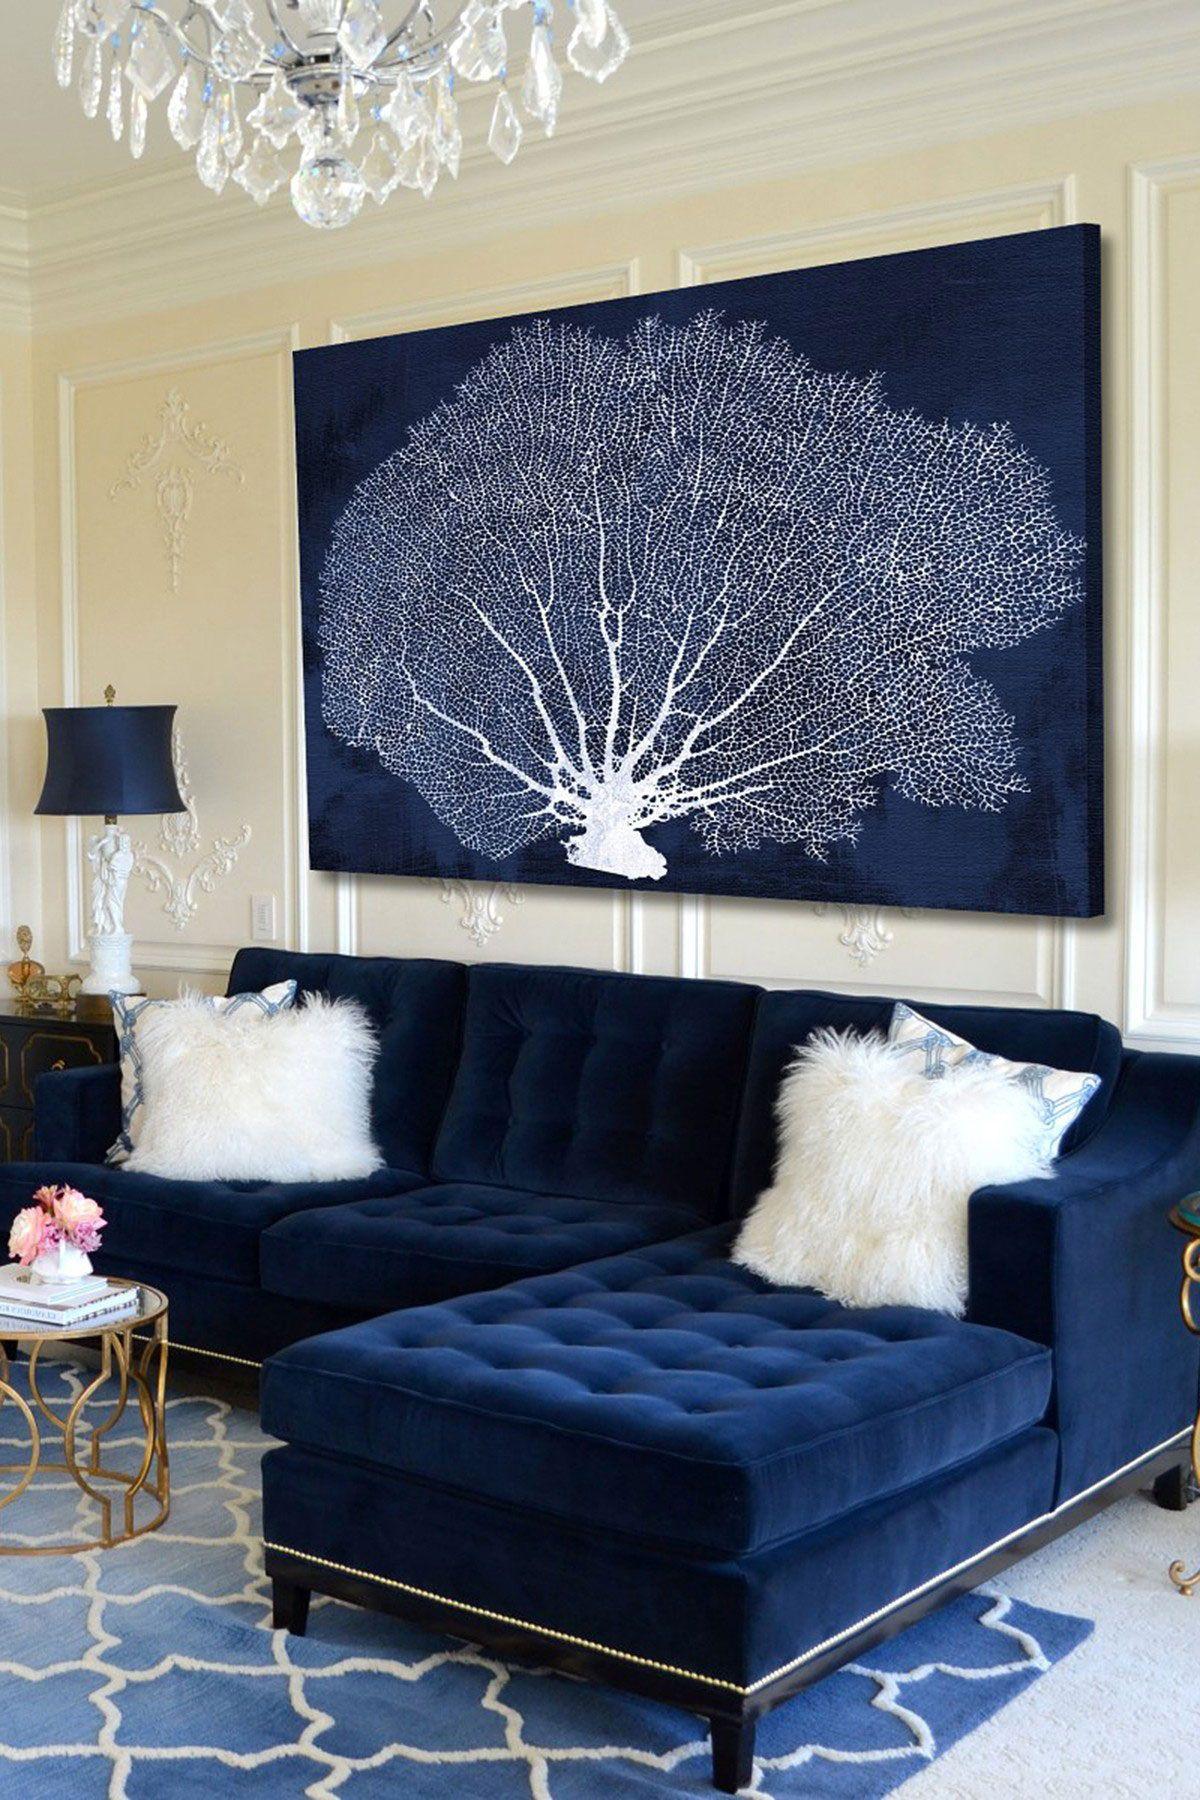 77 Blue Living Room Furniture Ideas 2021 Blue Sofas Living Room Blue Sofa Living Blue Living Room Decor